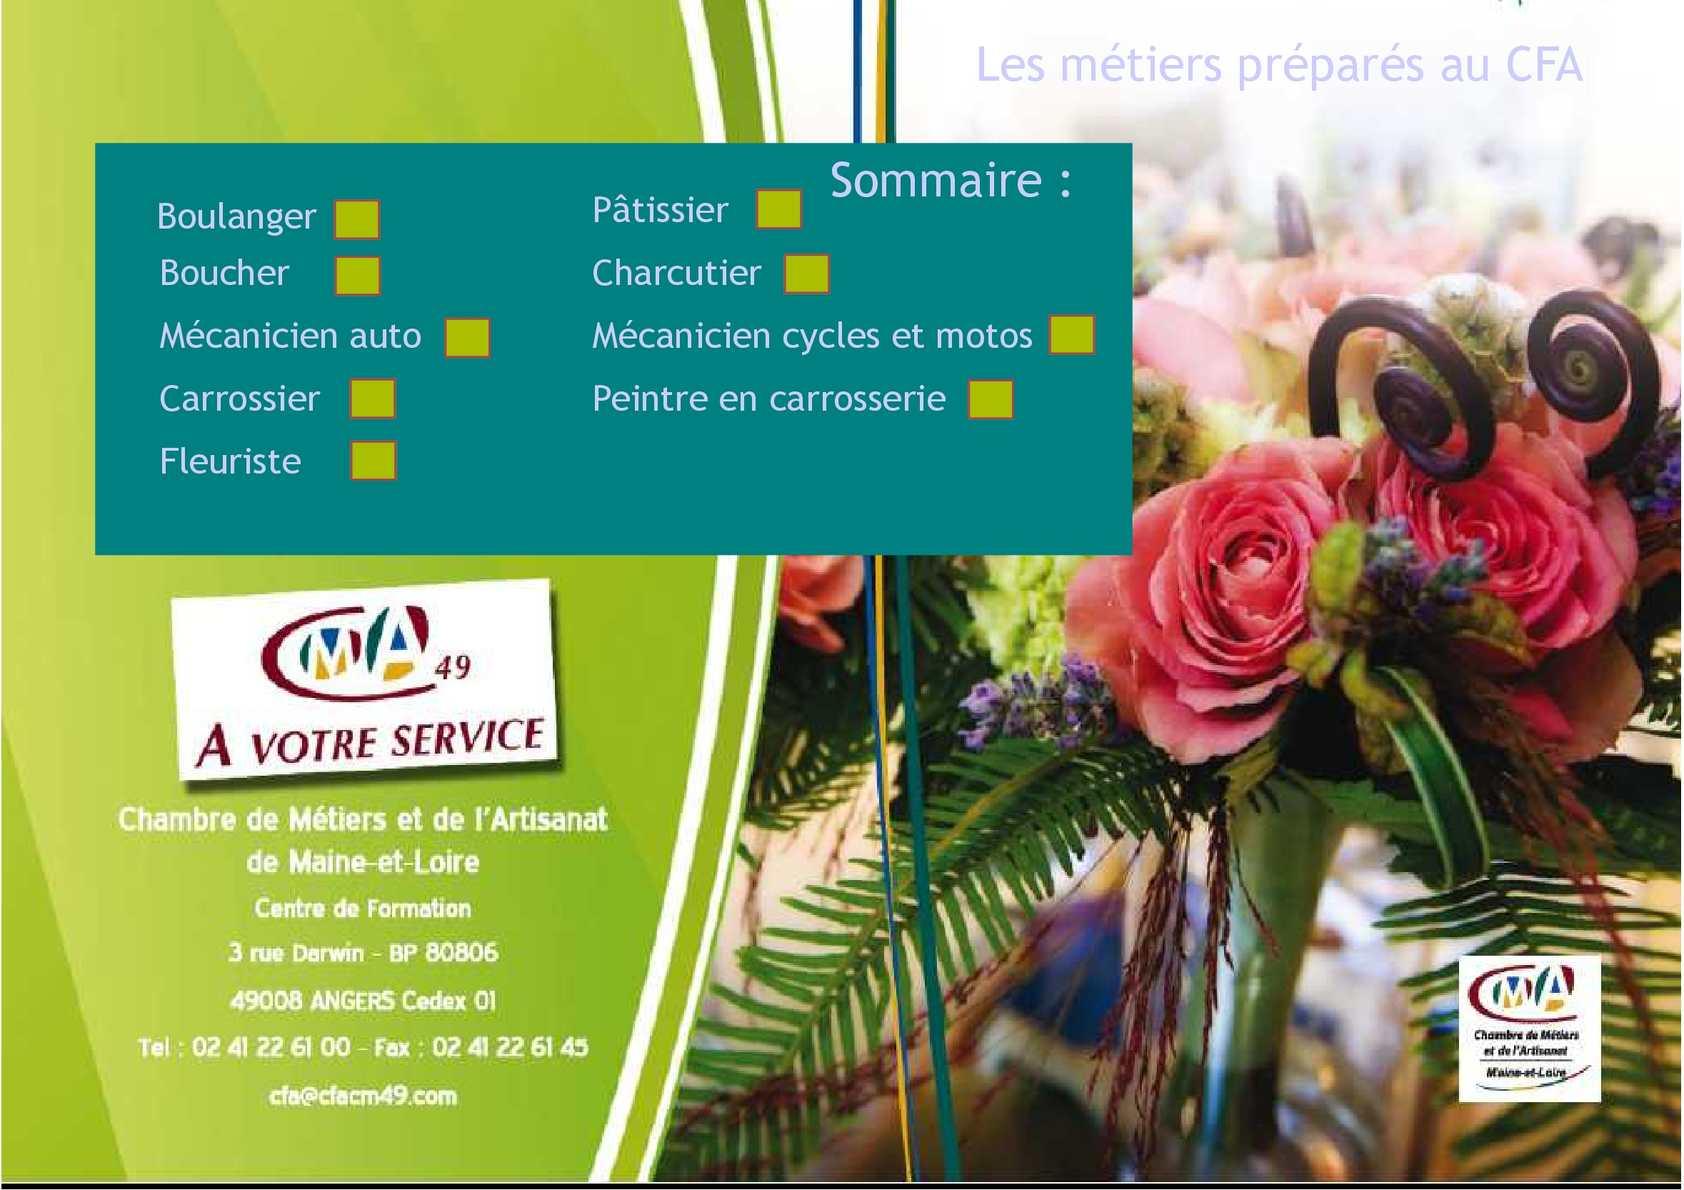 Calam o catalogue de formation cfa chambre des m tiers - Chambre des metiers apprentissage ...